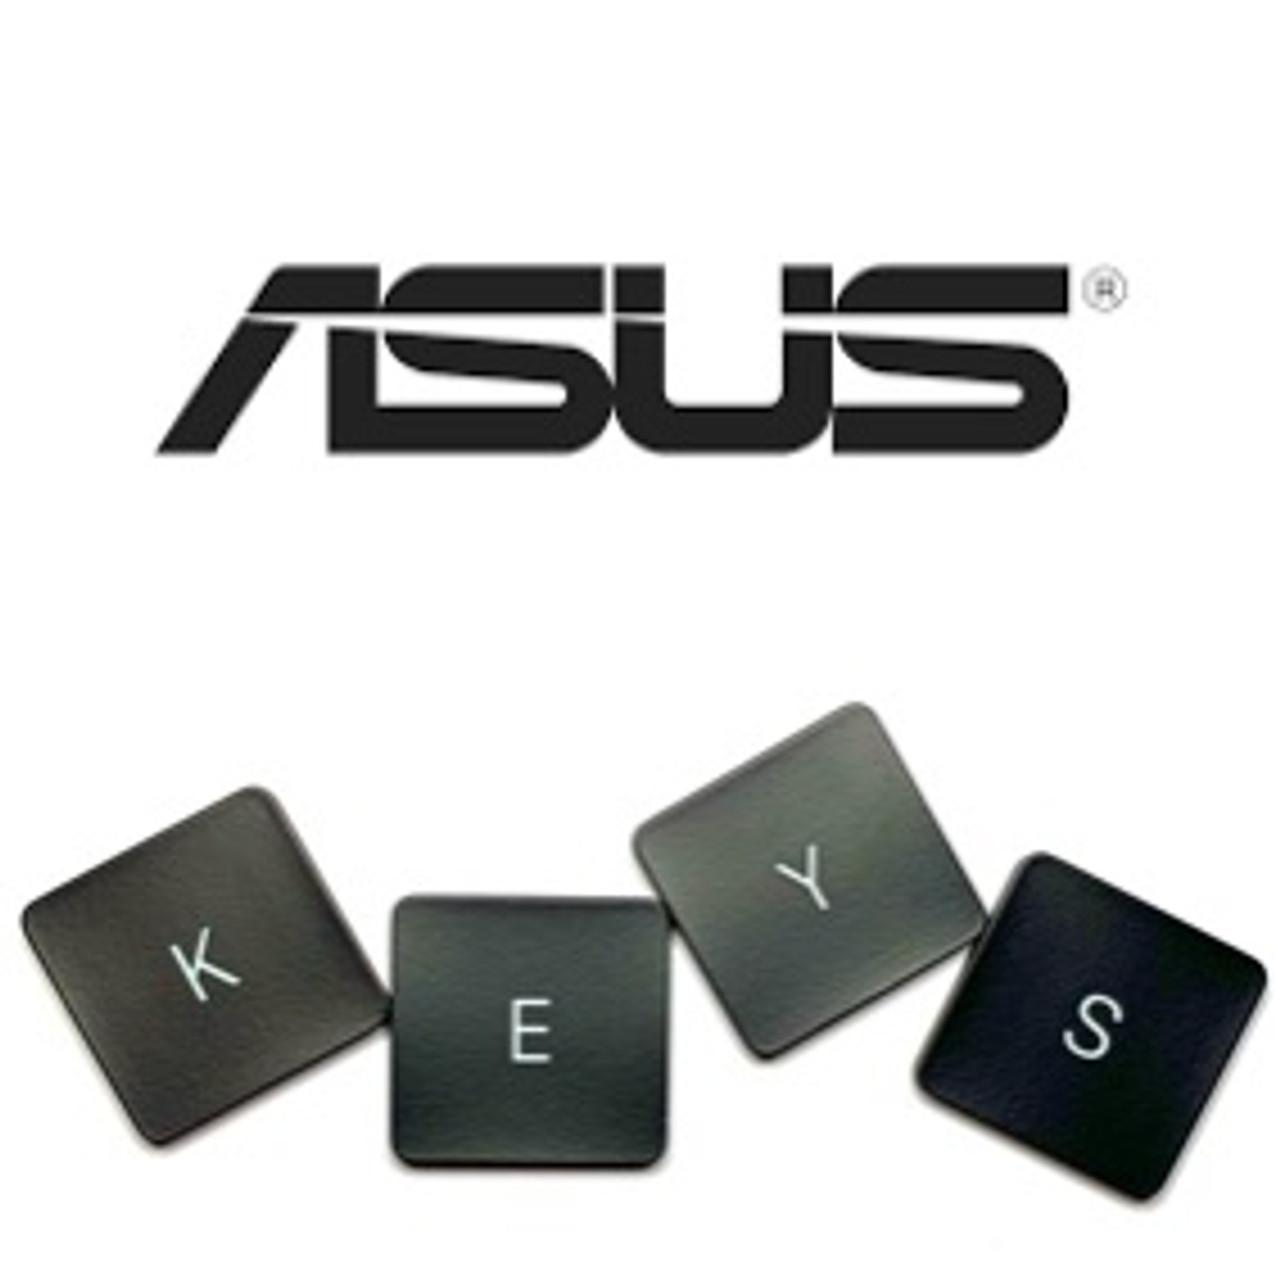 Asus Zenbook UX31 Laptop Key Replacement